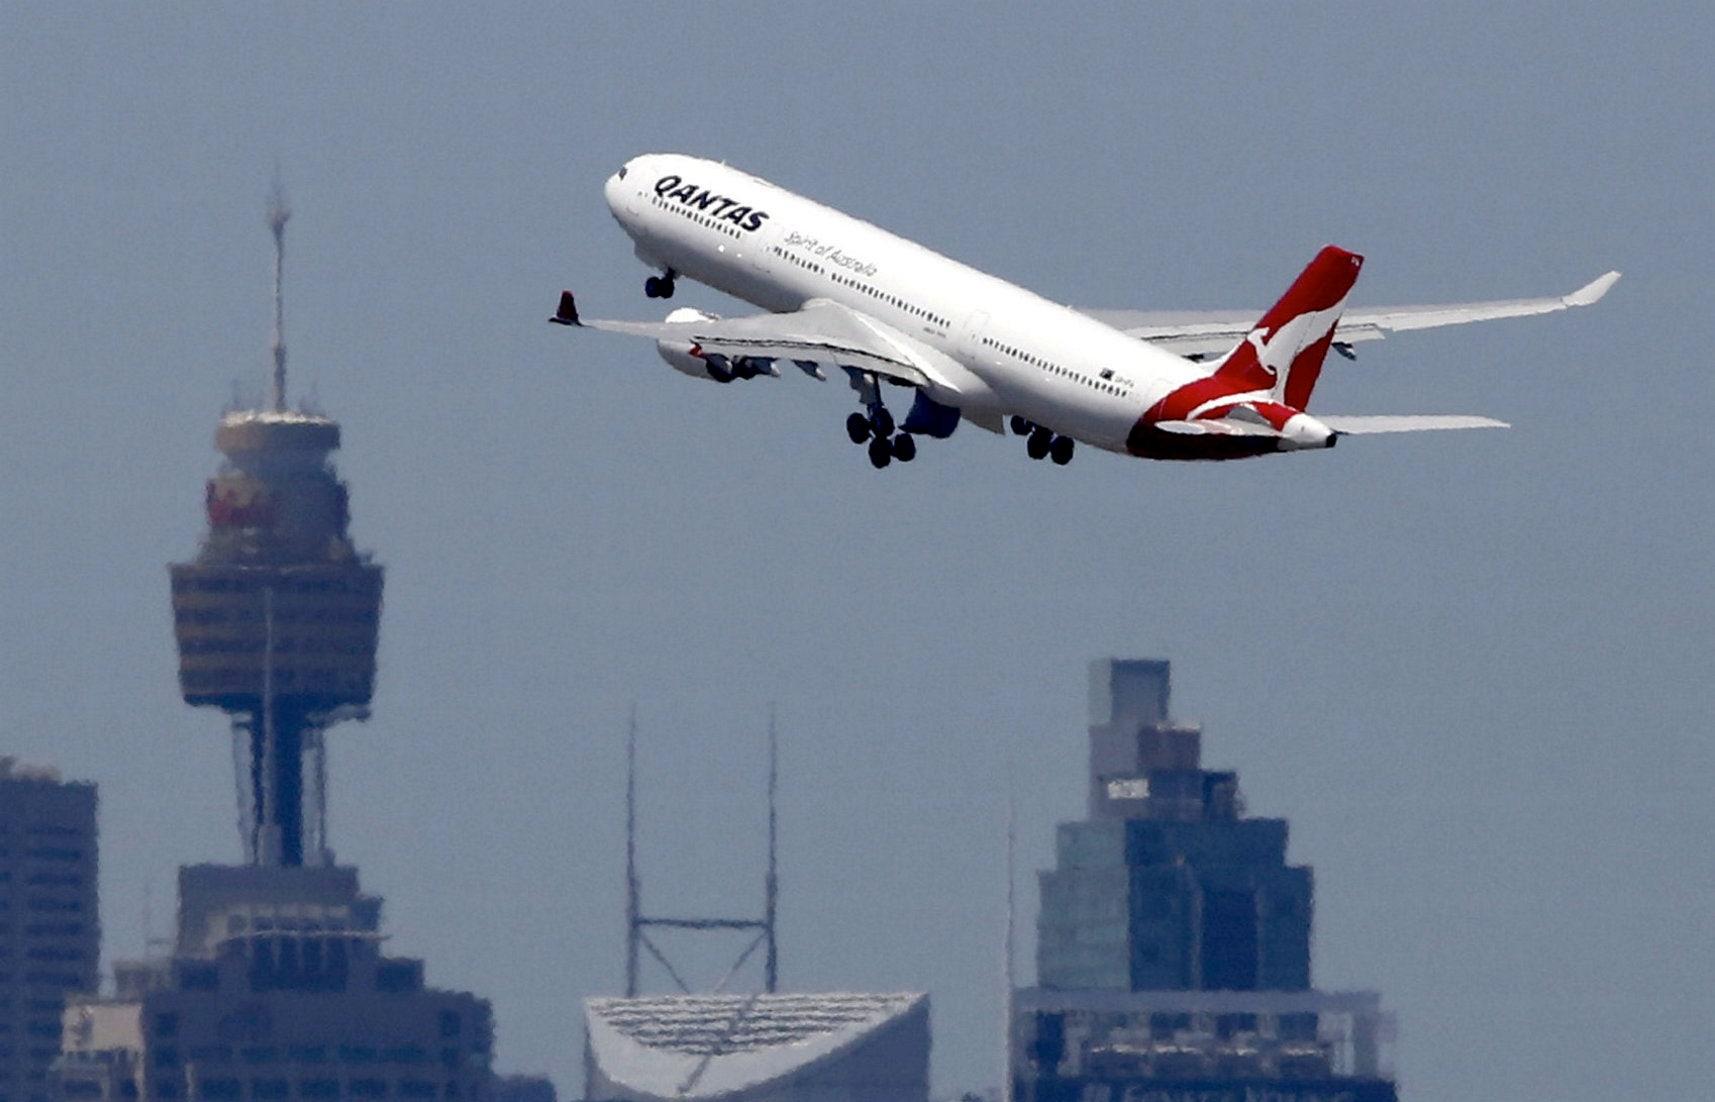 Qantas passenger given jail time after 'body slamming' flight attendant